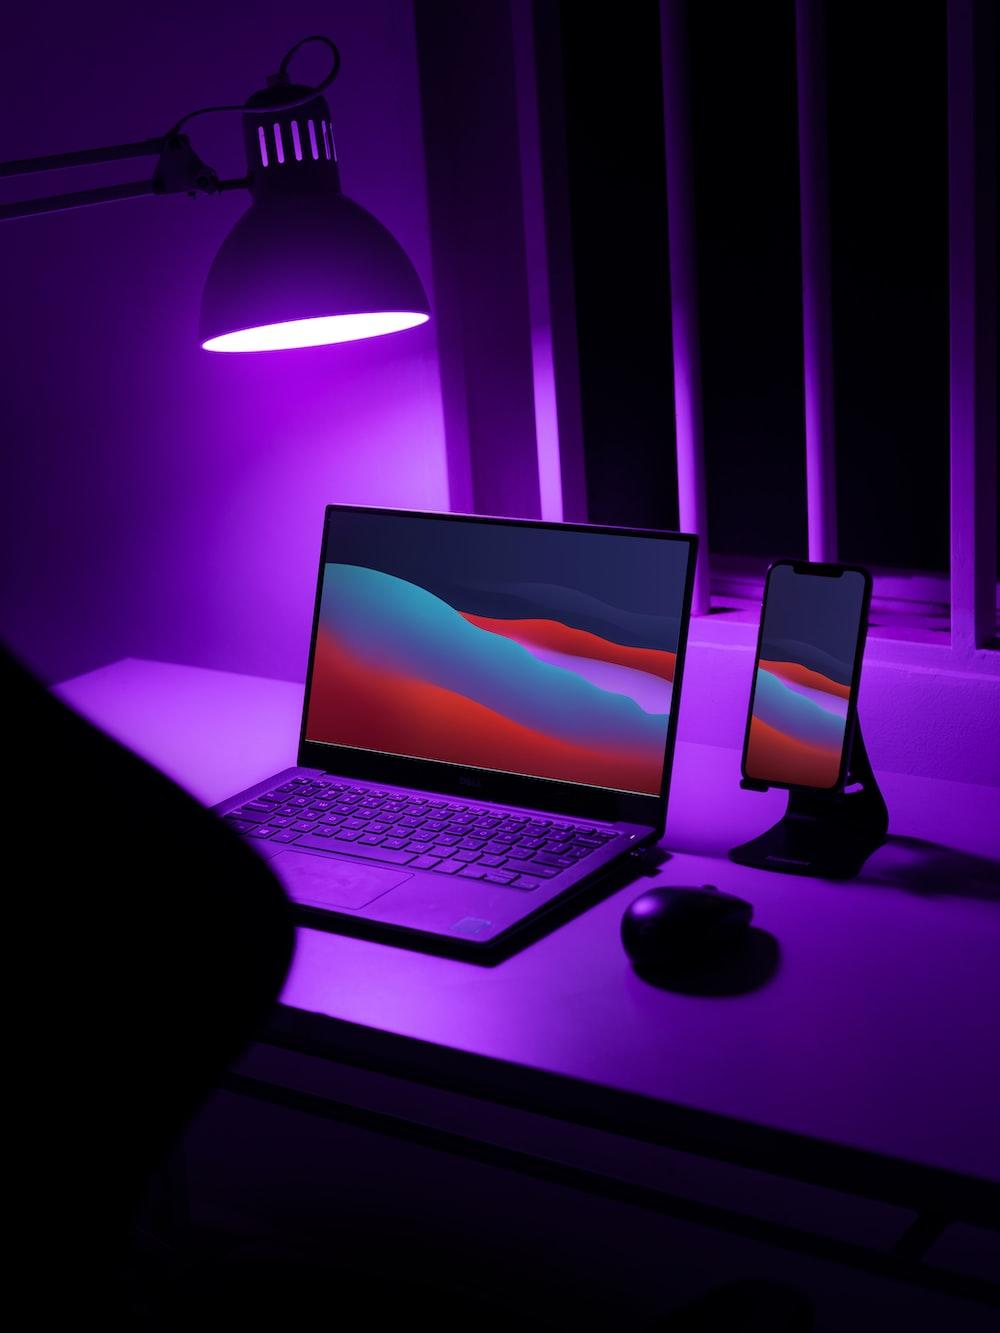 black laptop computer turned on beside black and silver desk lamp